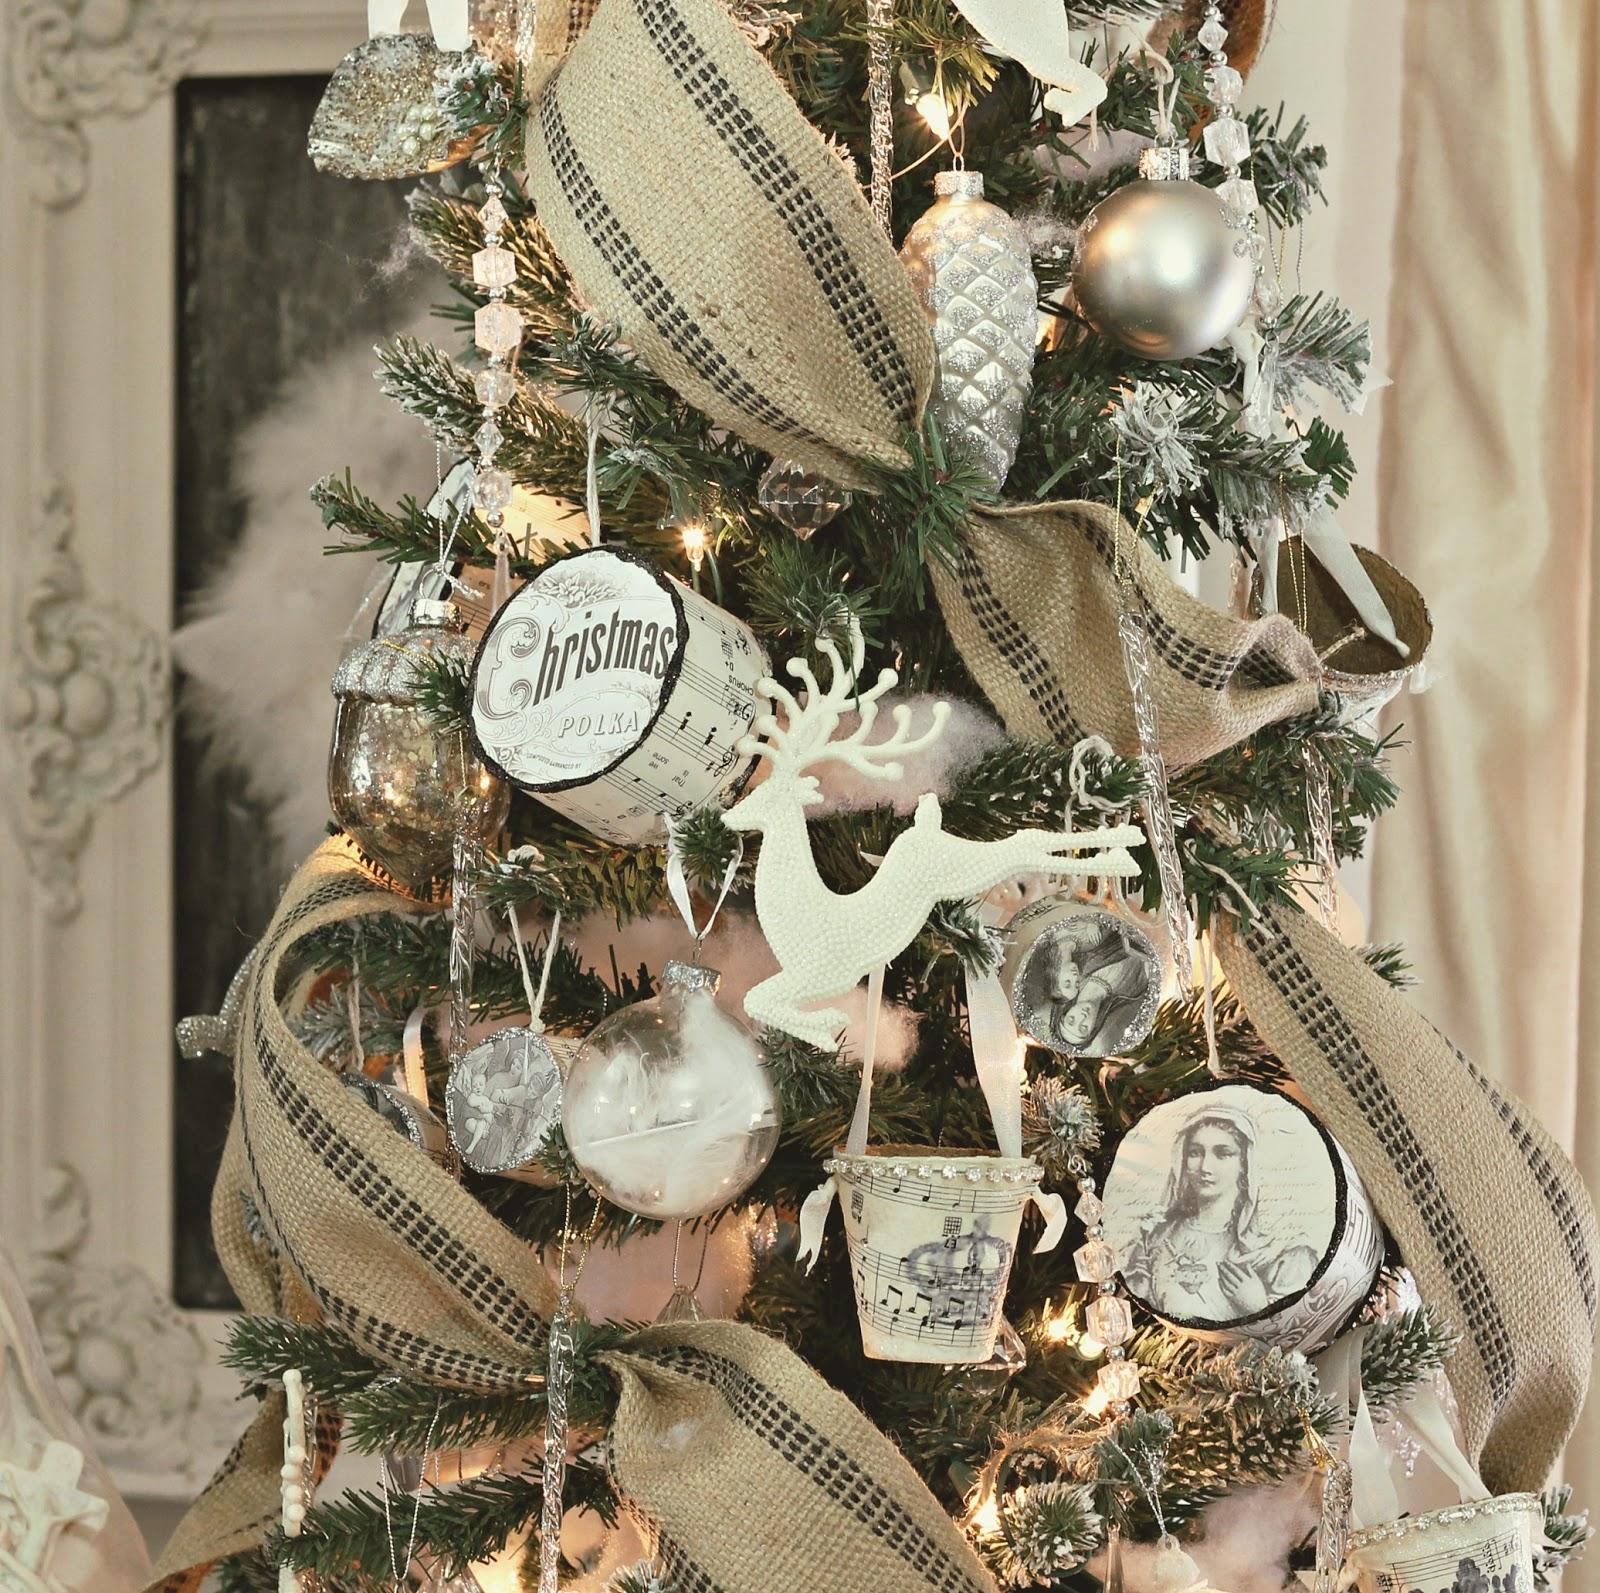 Burlap ribbon ivory decorations christmas pinterest for Decorating with burlap ribbon for christmas